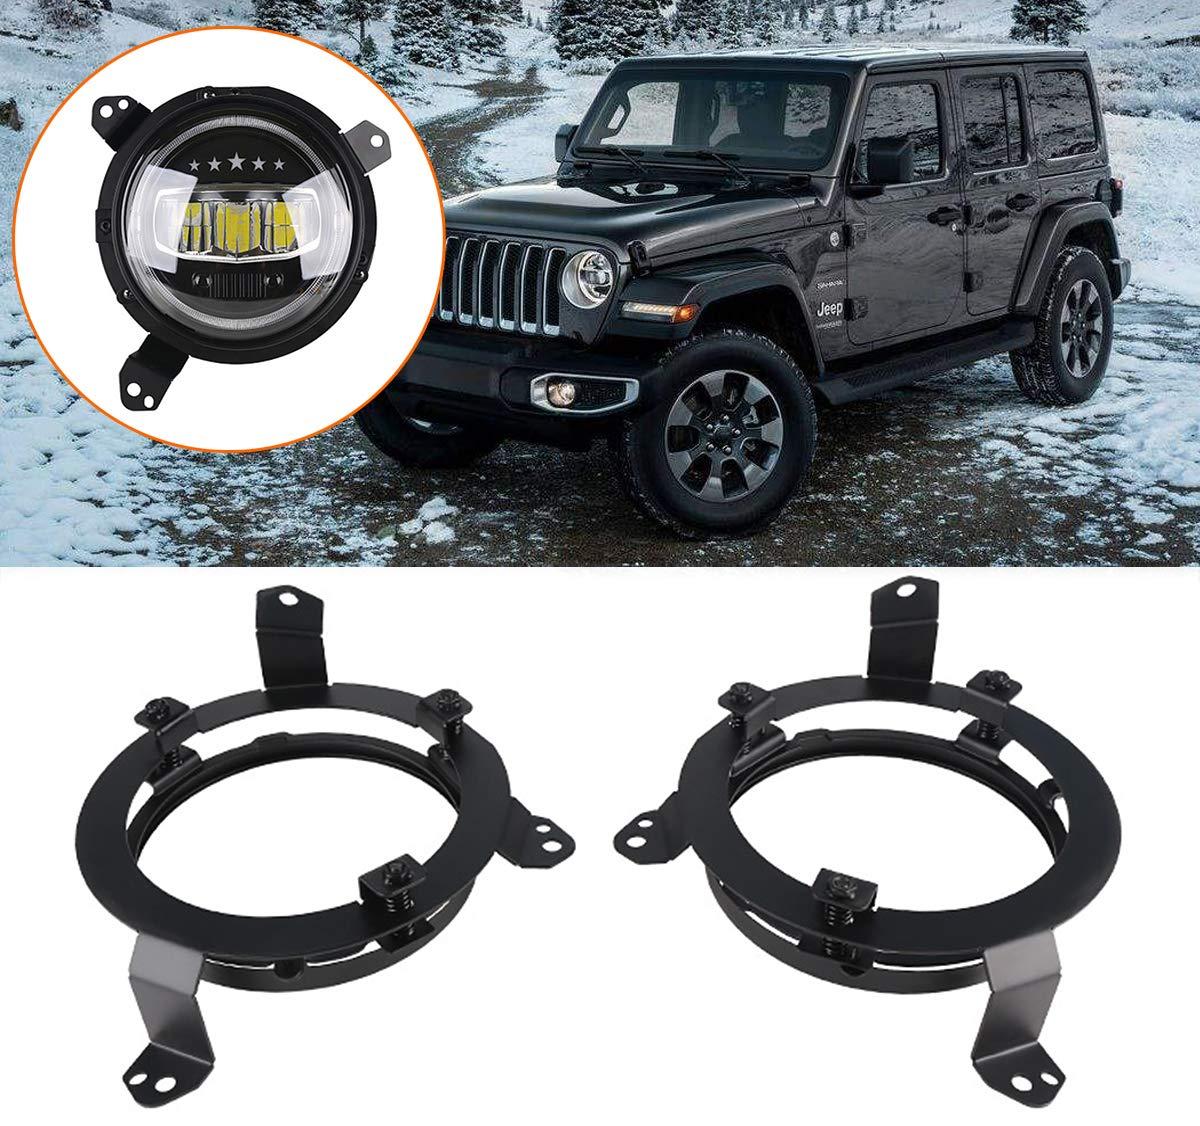 YOCTM 7 Inch Round LED Headlight Mounting Bracket Adjustable for Jeep Wrangler JL 2018 2019 7 LED Headlamp Mount Ring Bezels Black